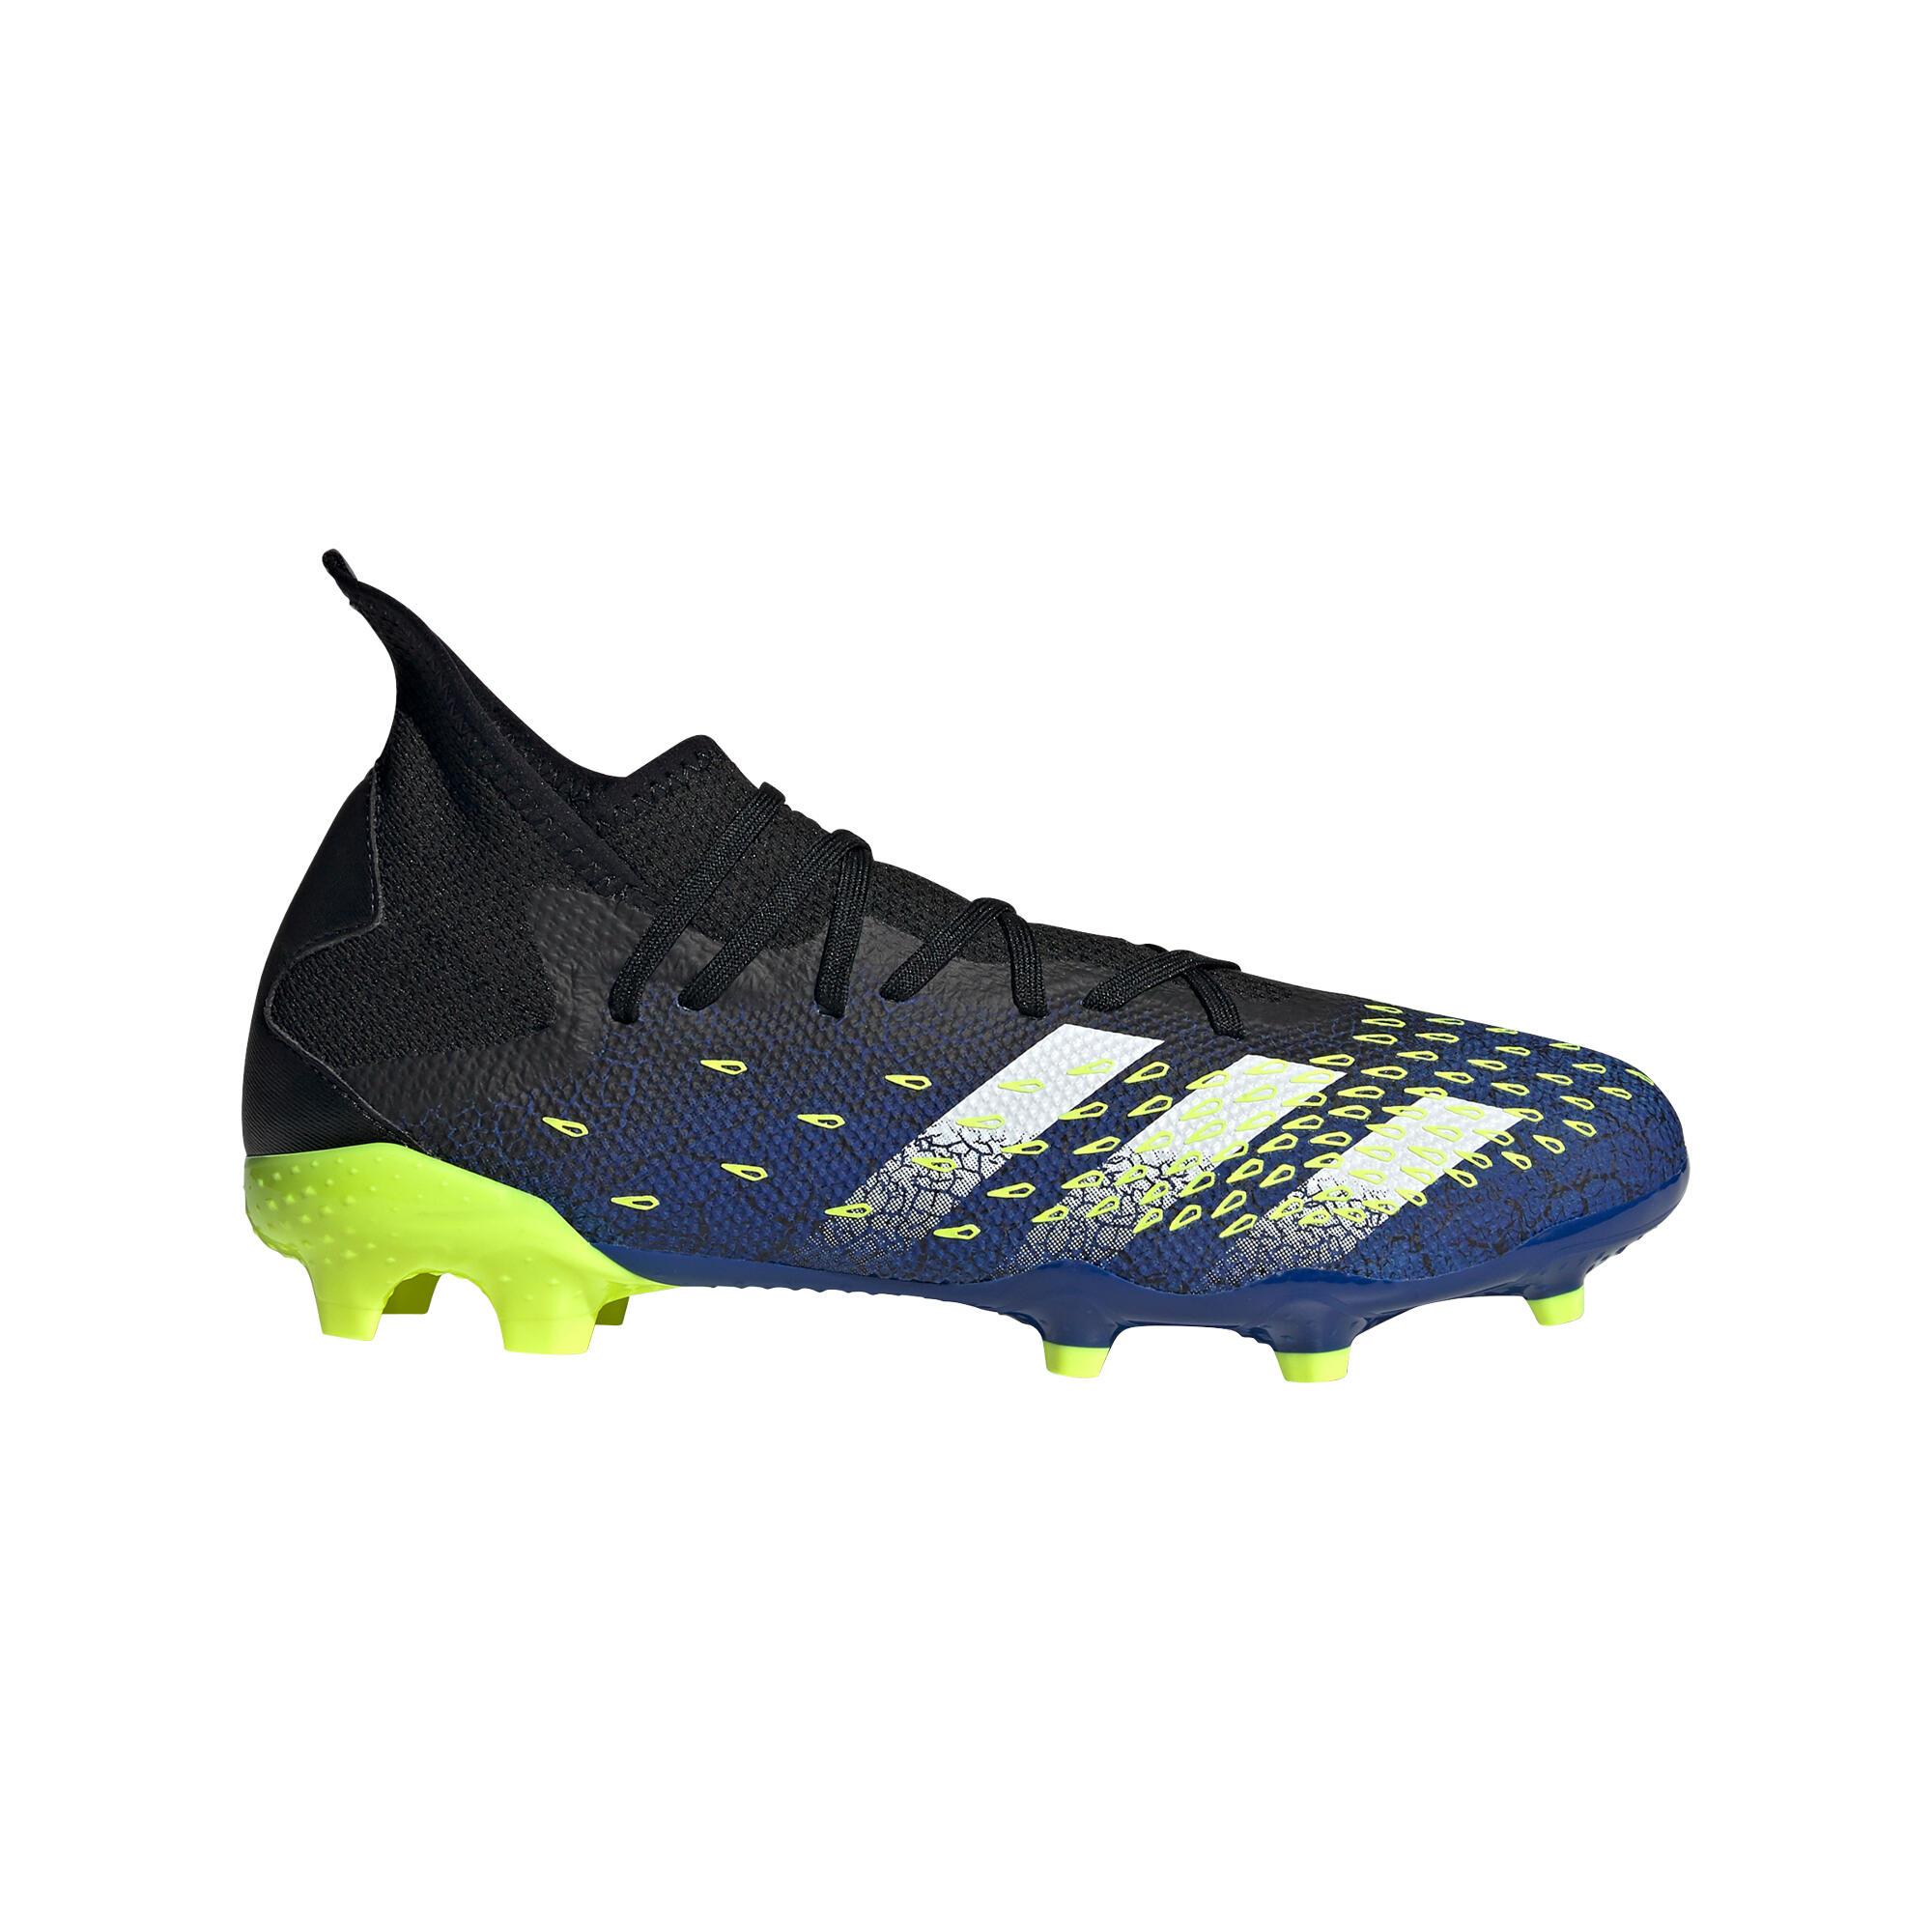 Chaussures de football Predator Freak .3 FG adidas adulte